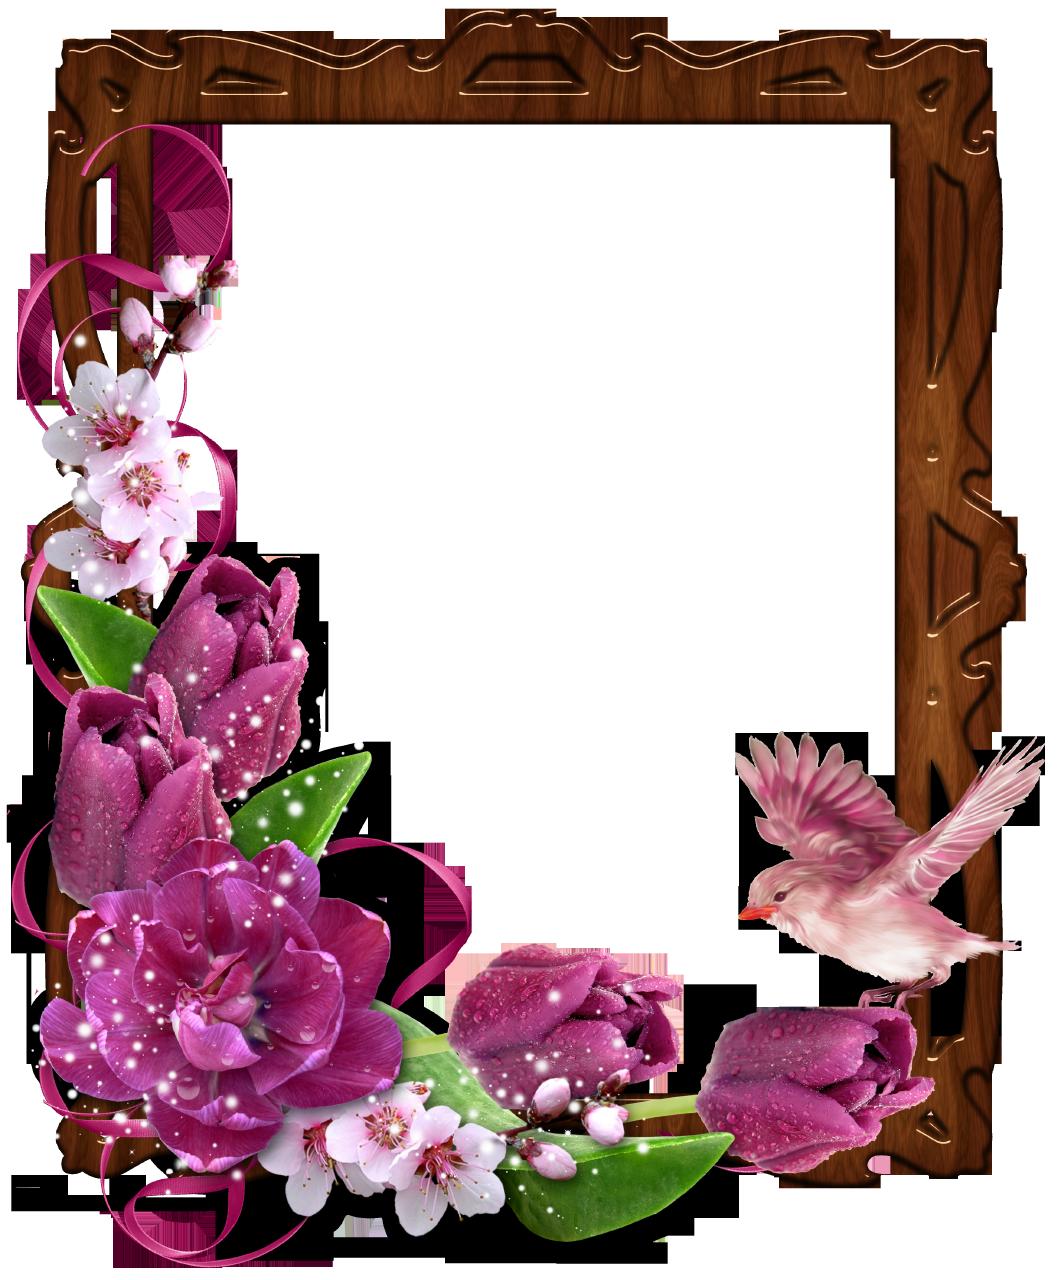 FloralBorderWoodenPhotoFramewithBirdandFlowers